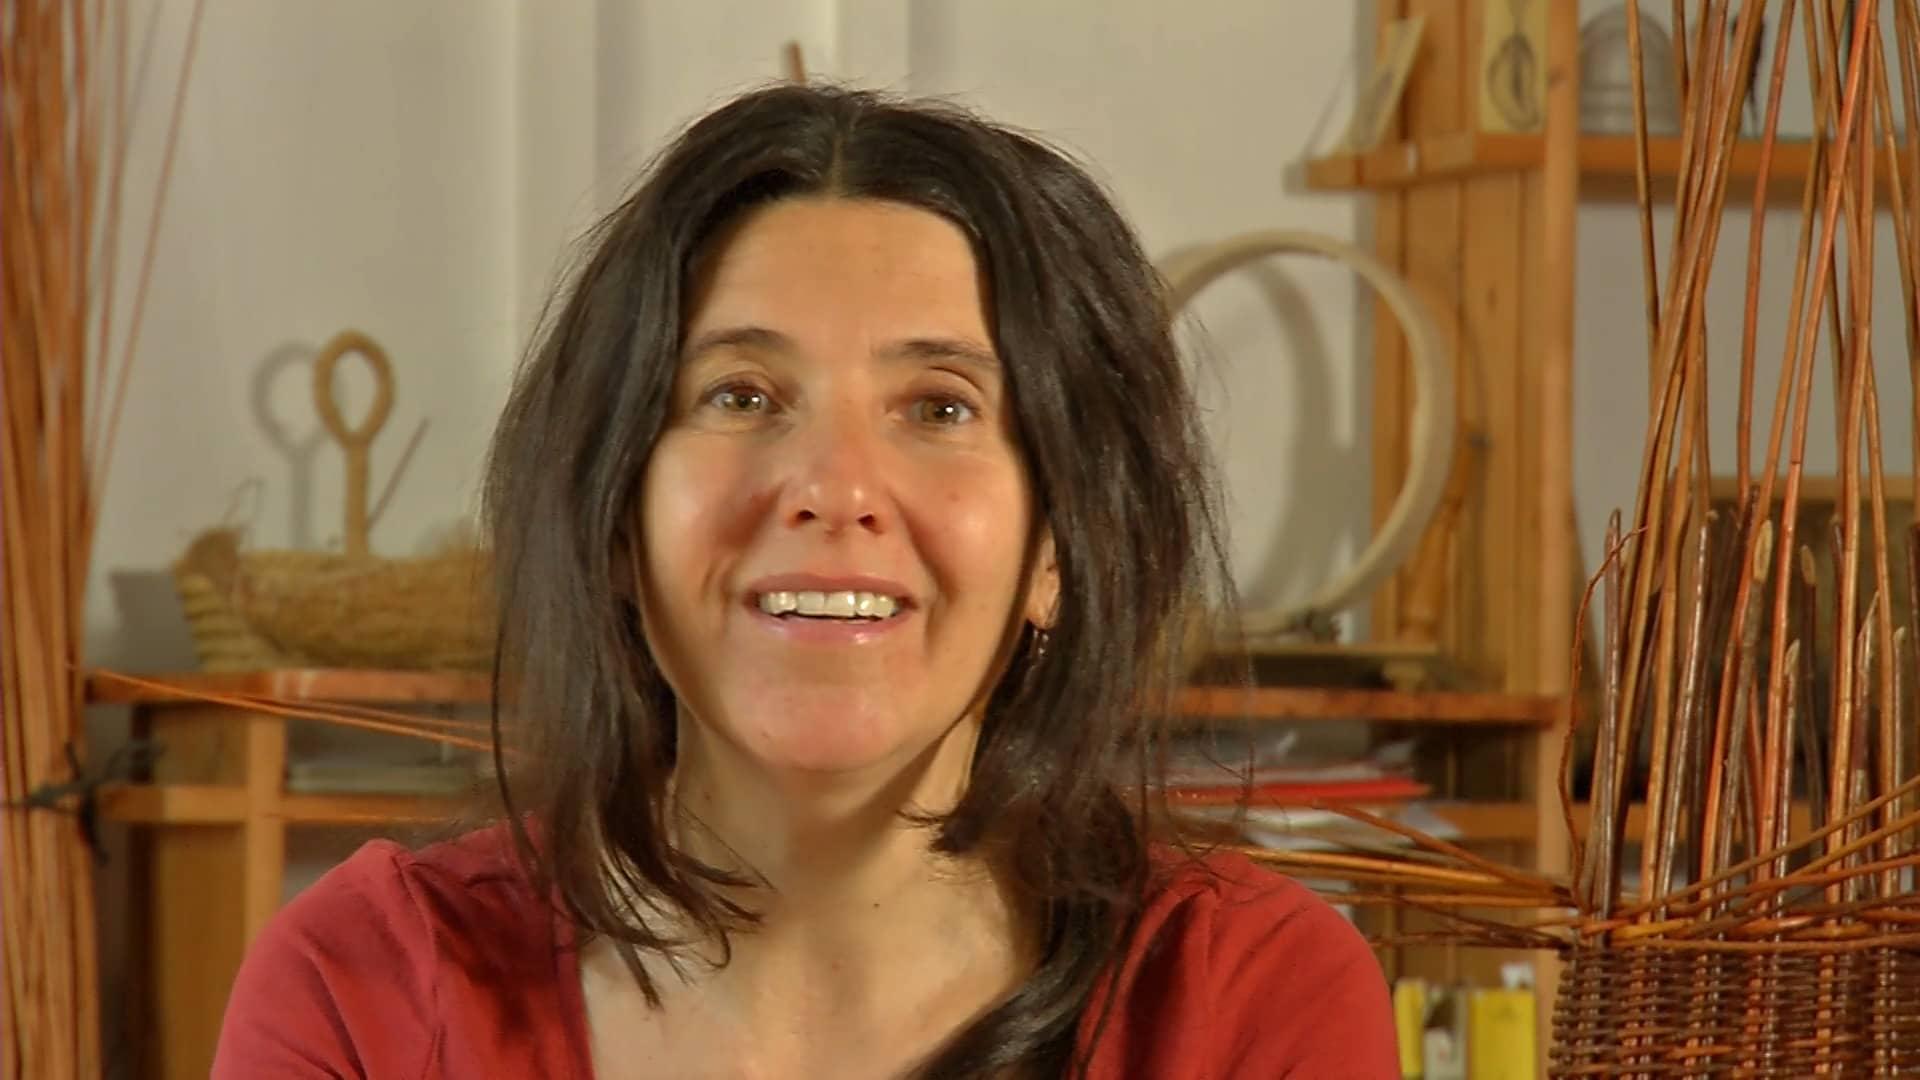 La artista Lucía Loren